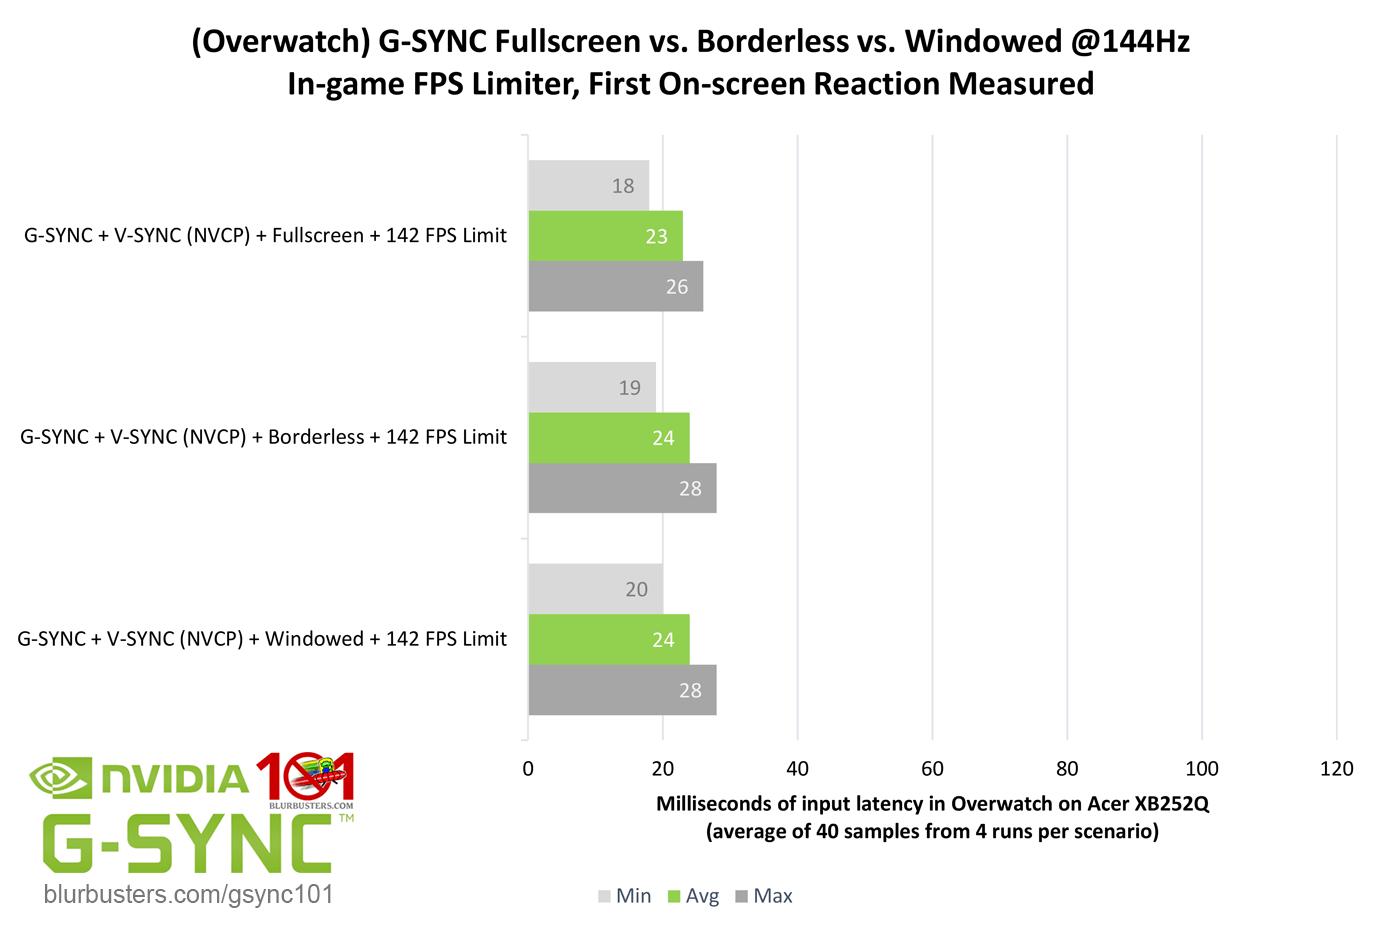 G-SYNC 101: G-SYNC Fullscreen vs  Borderless/Windowed | Blur